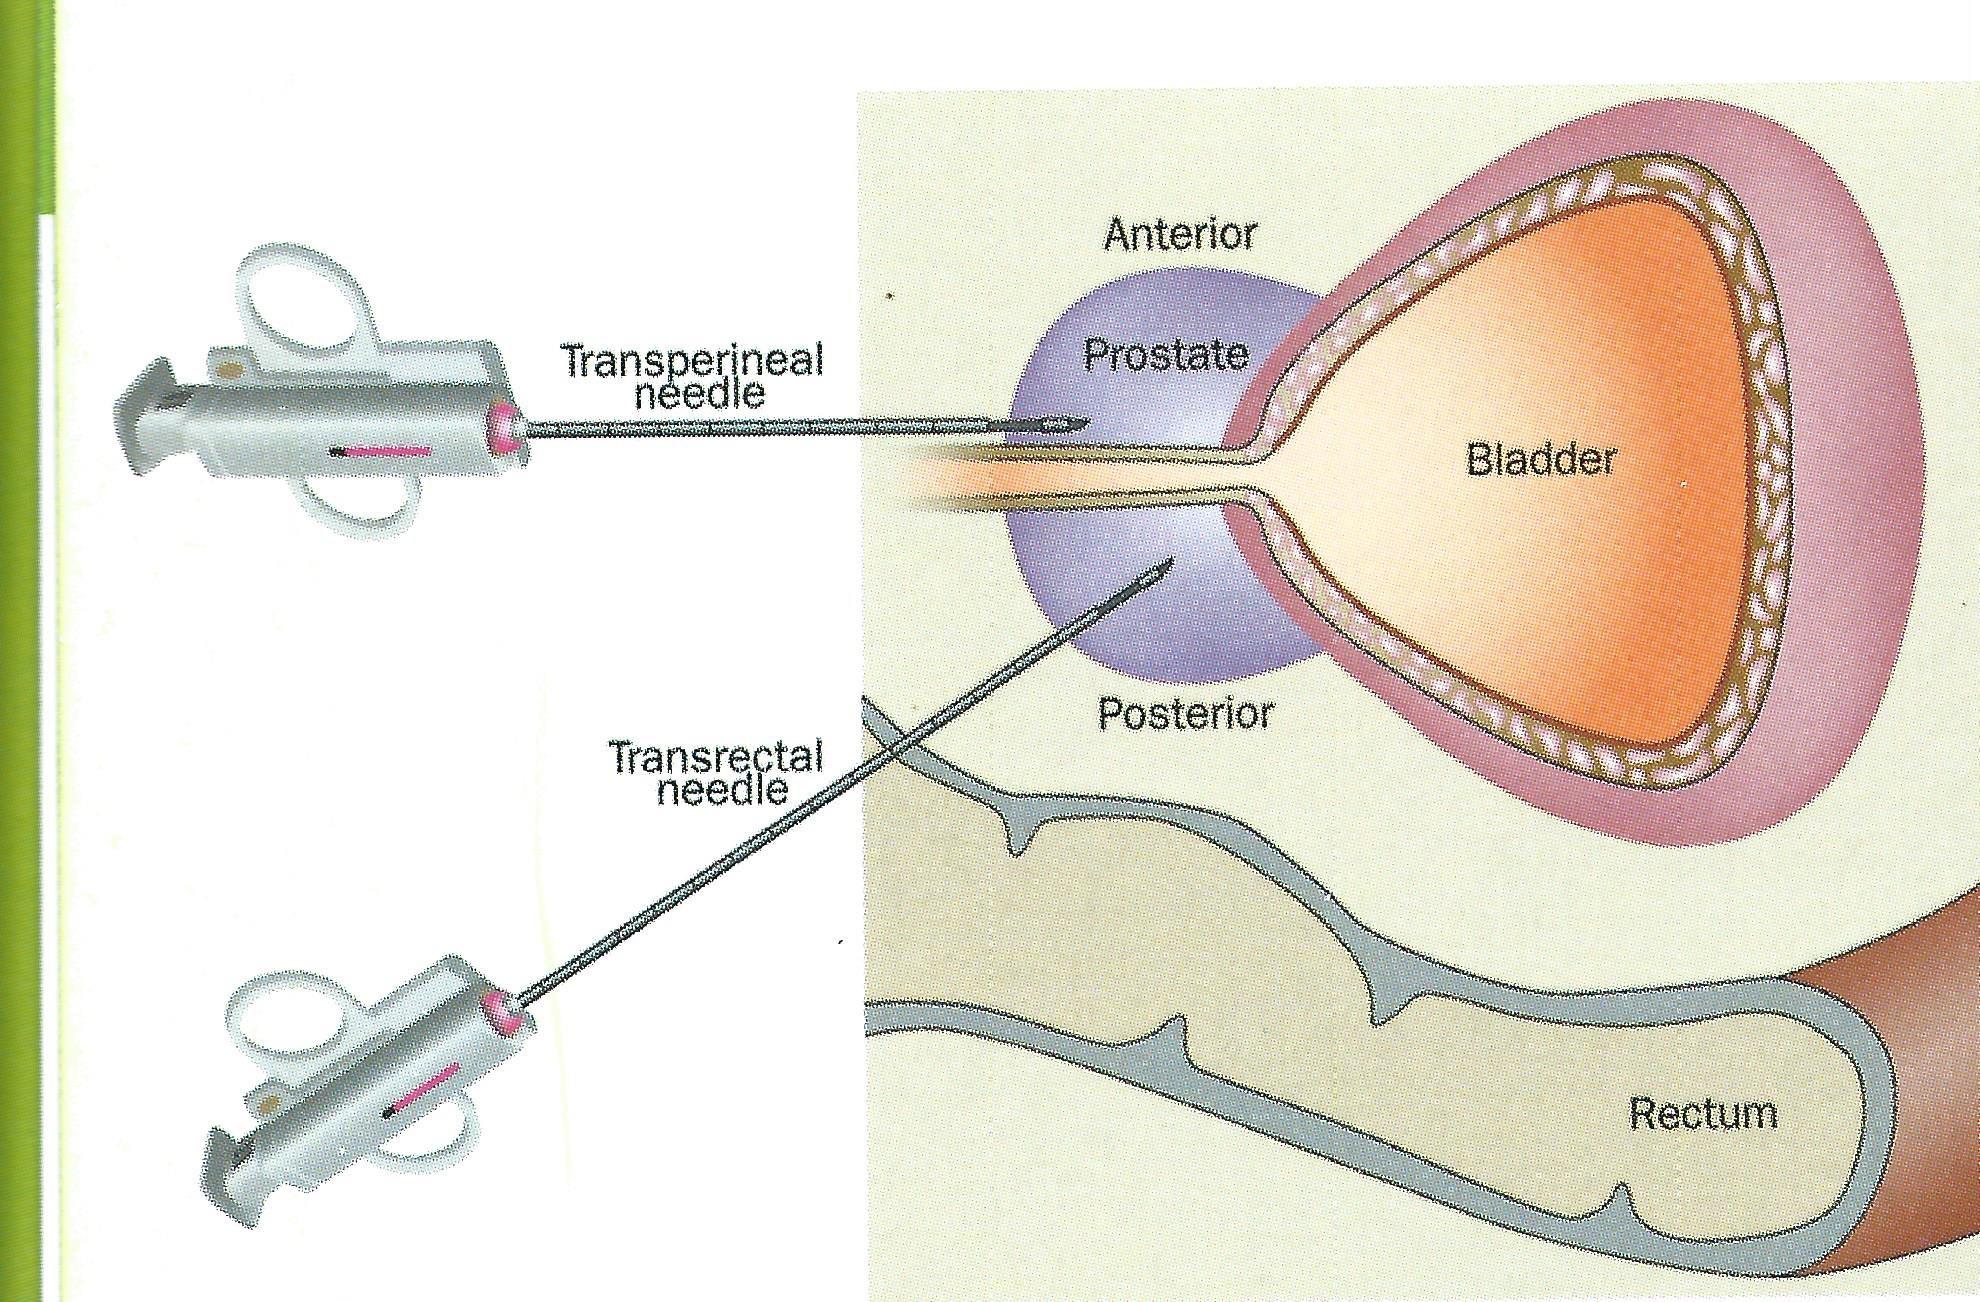 biopsia-perineal-guiada-mediante-fusion